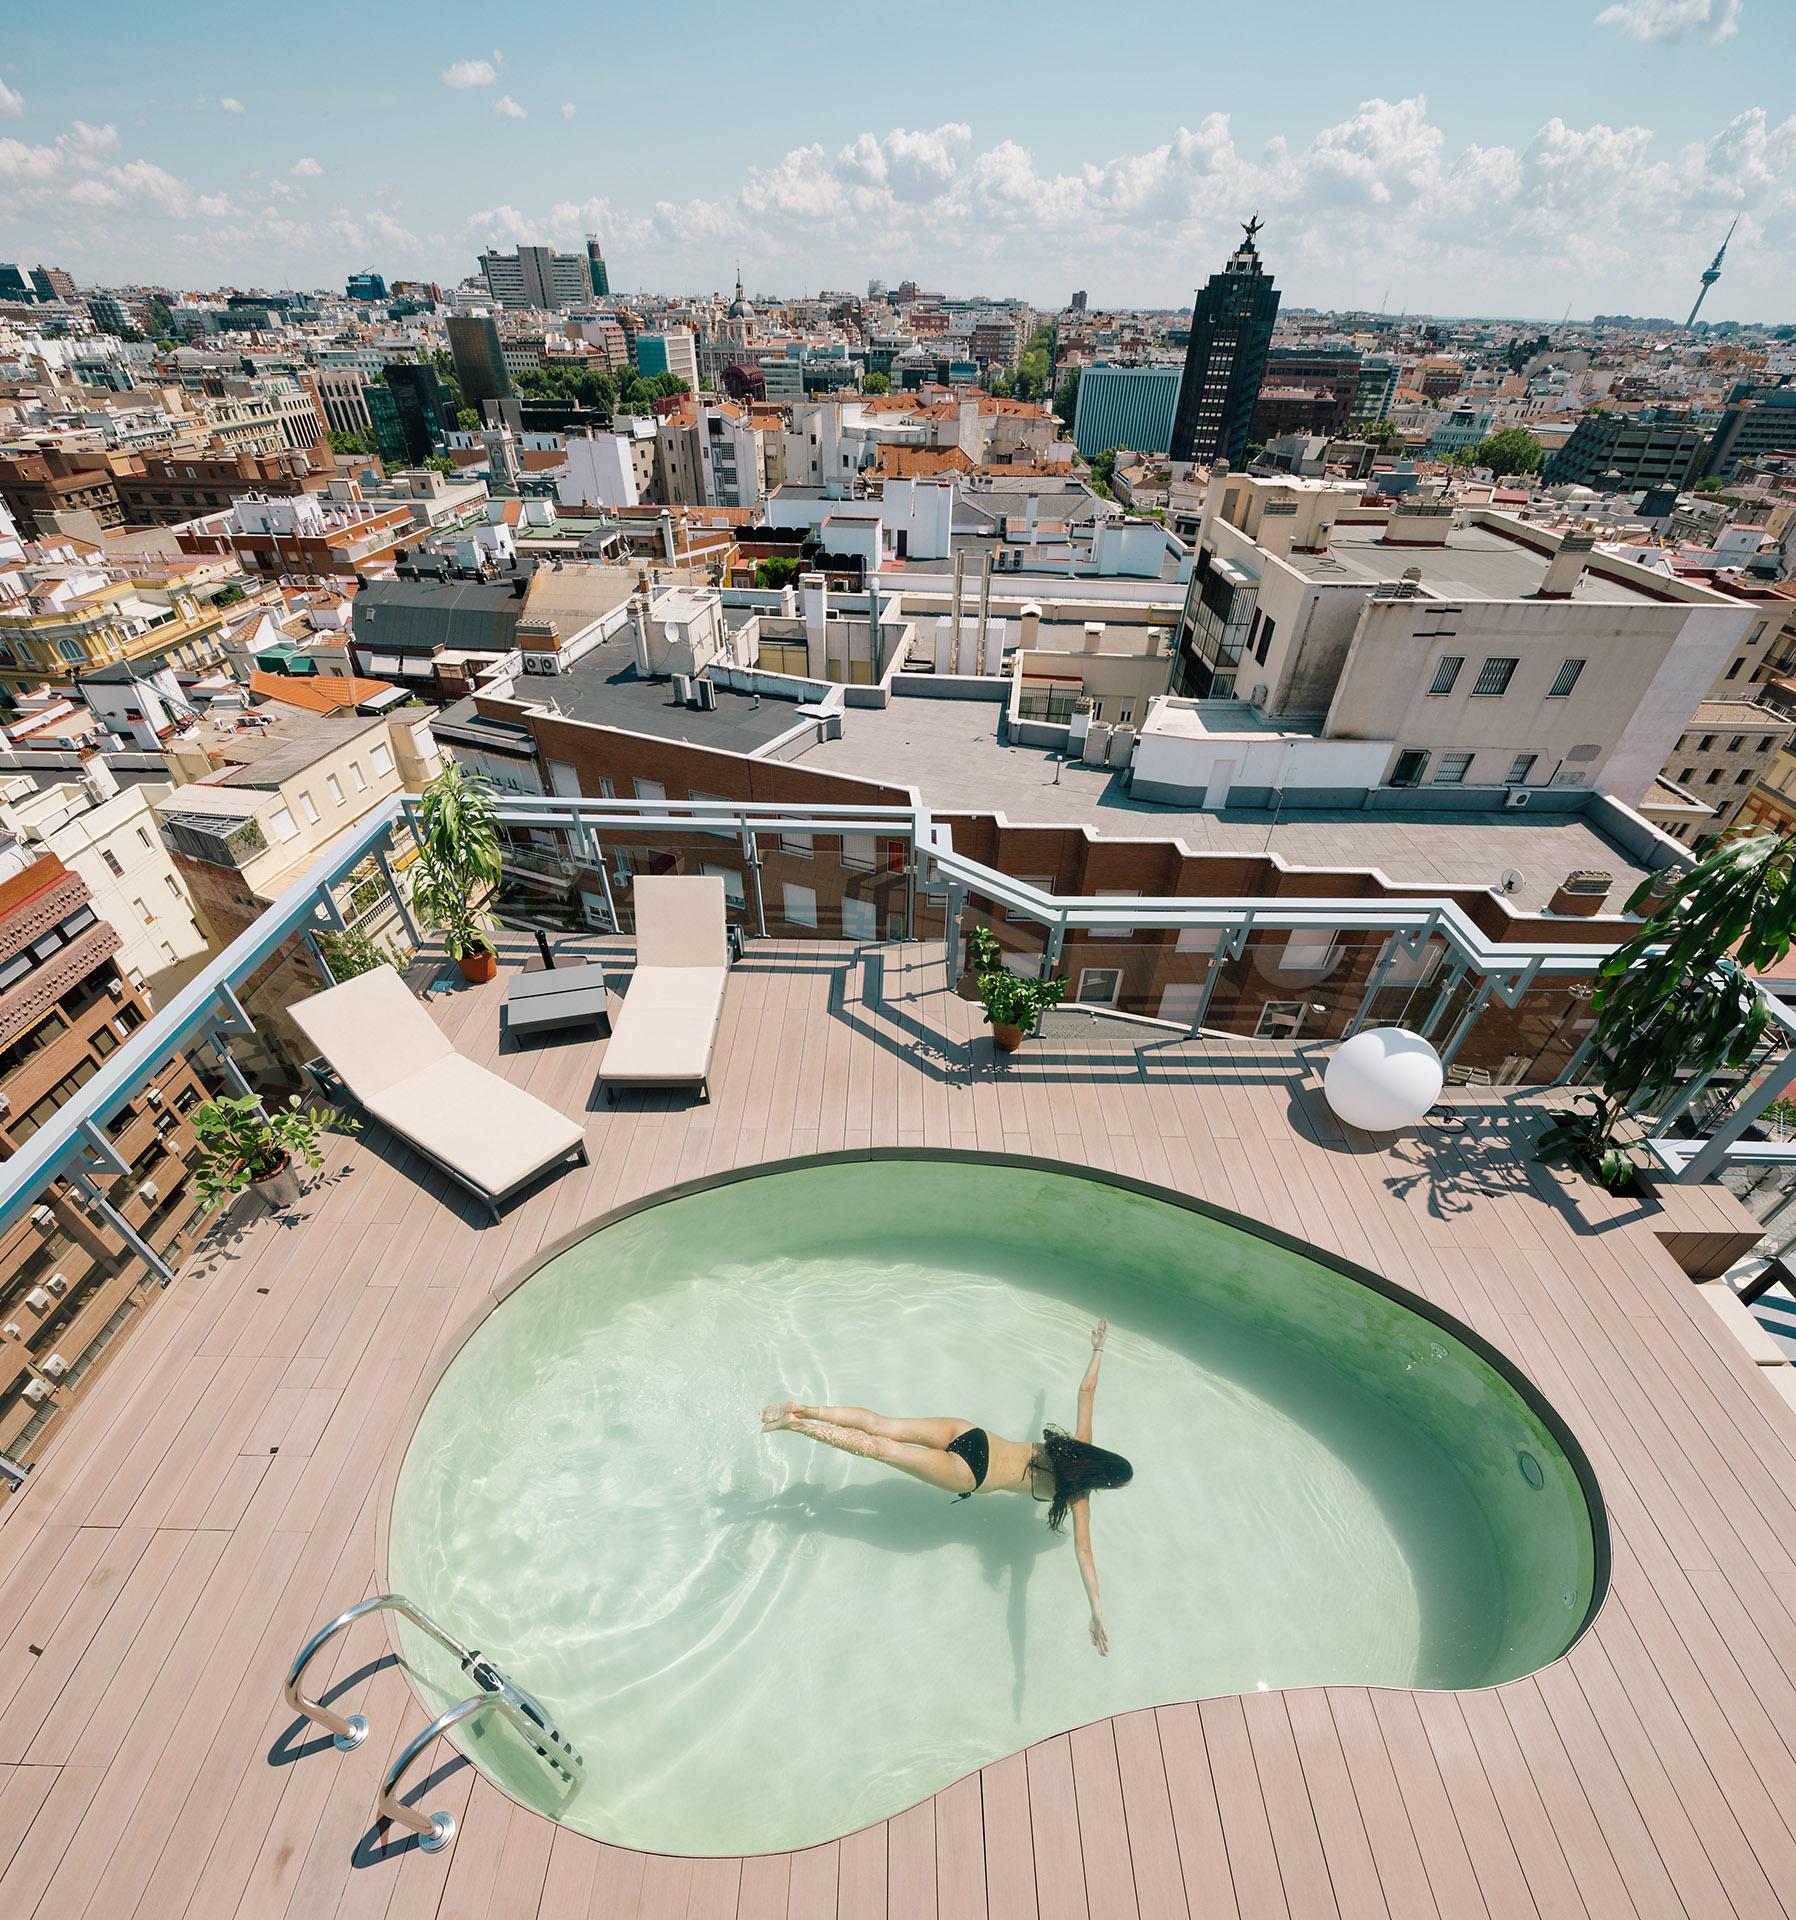 Idoia Otegui idoiaotegui arquitectura reforma rehabilitación Atico piscina